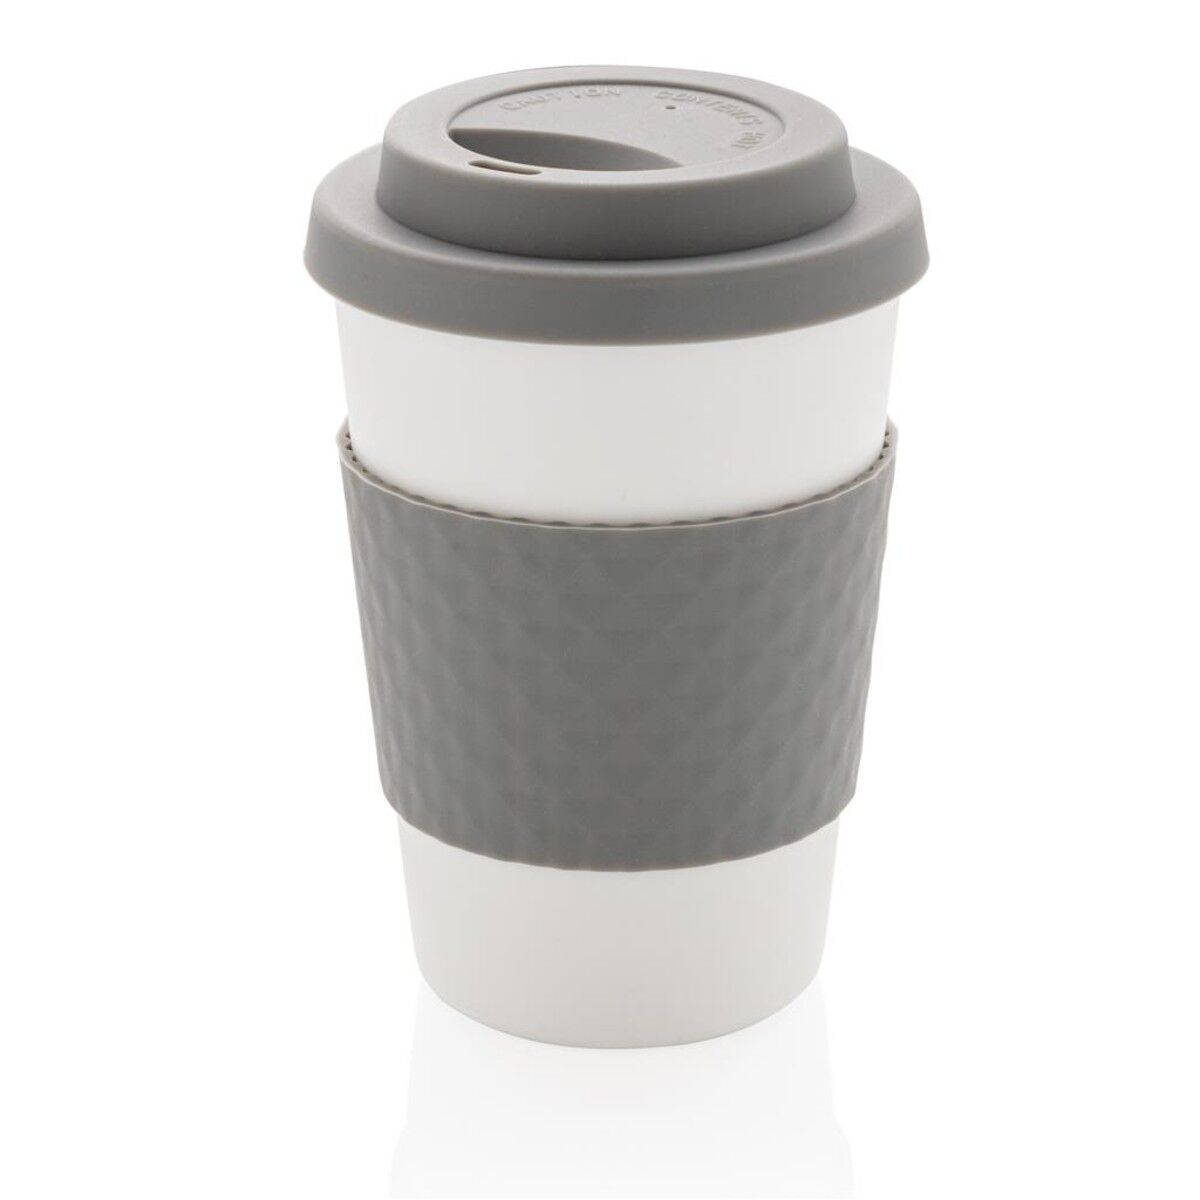 270ml reusable cup